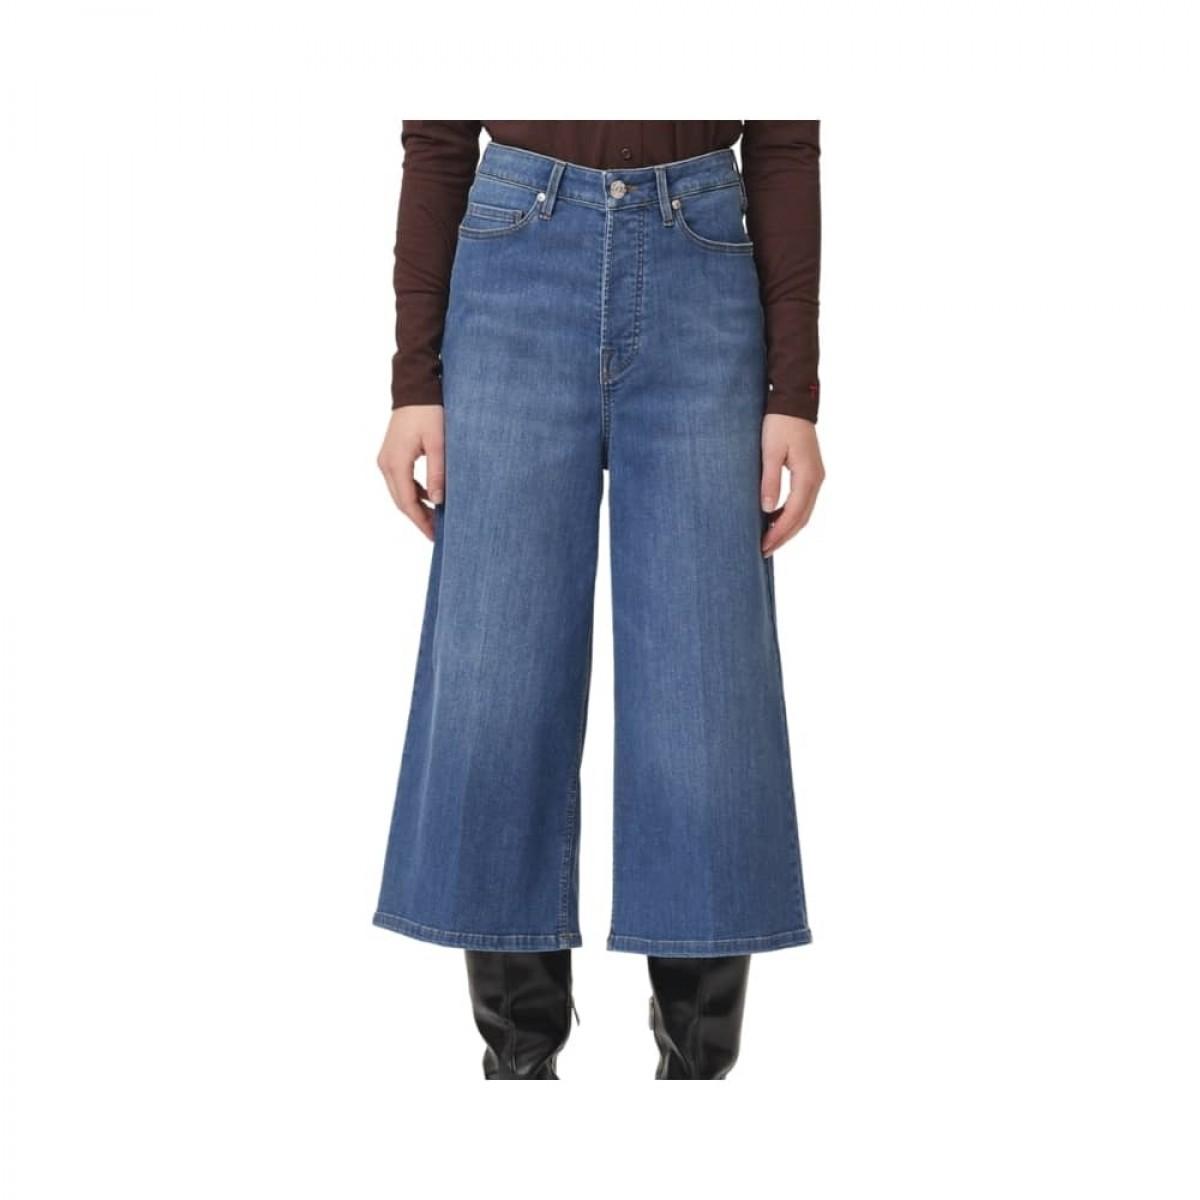 mandela culotte jeans - blue - ben detalje